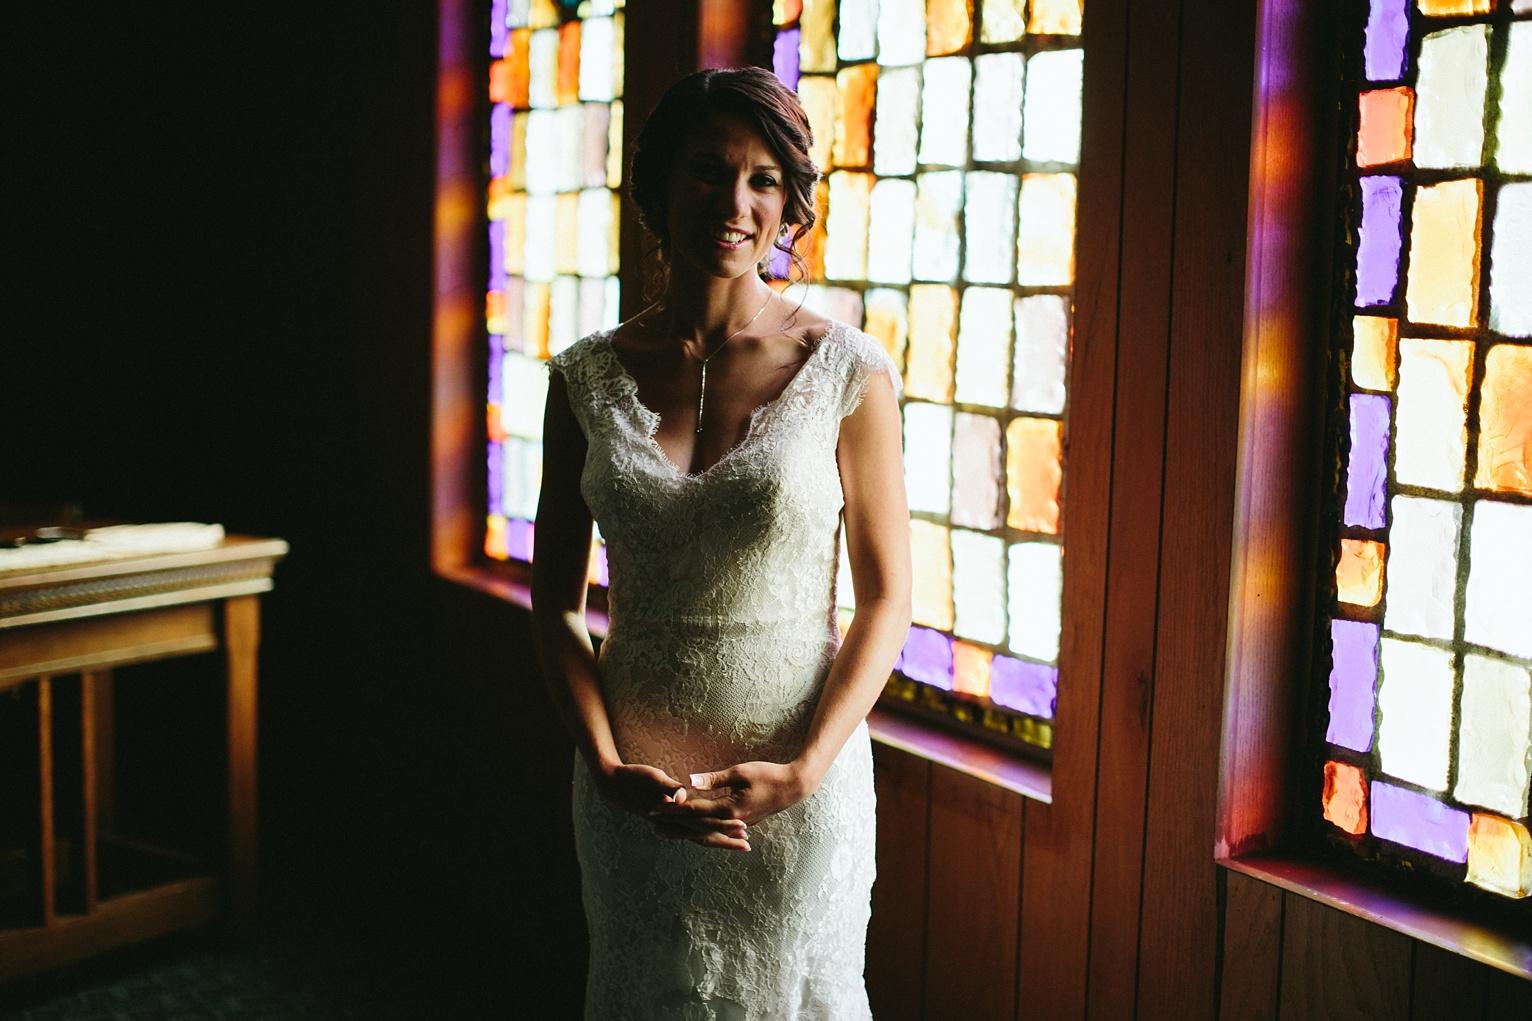 Dreamtownco.com_blog_Stephen&Carly_Wedding_0020.jpg